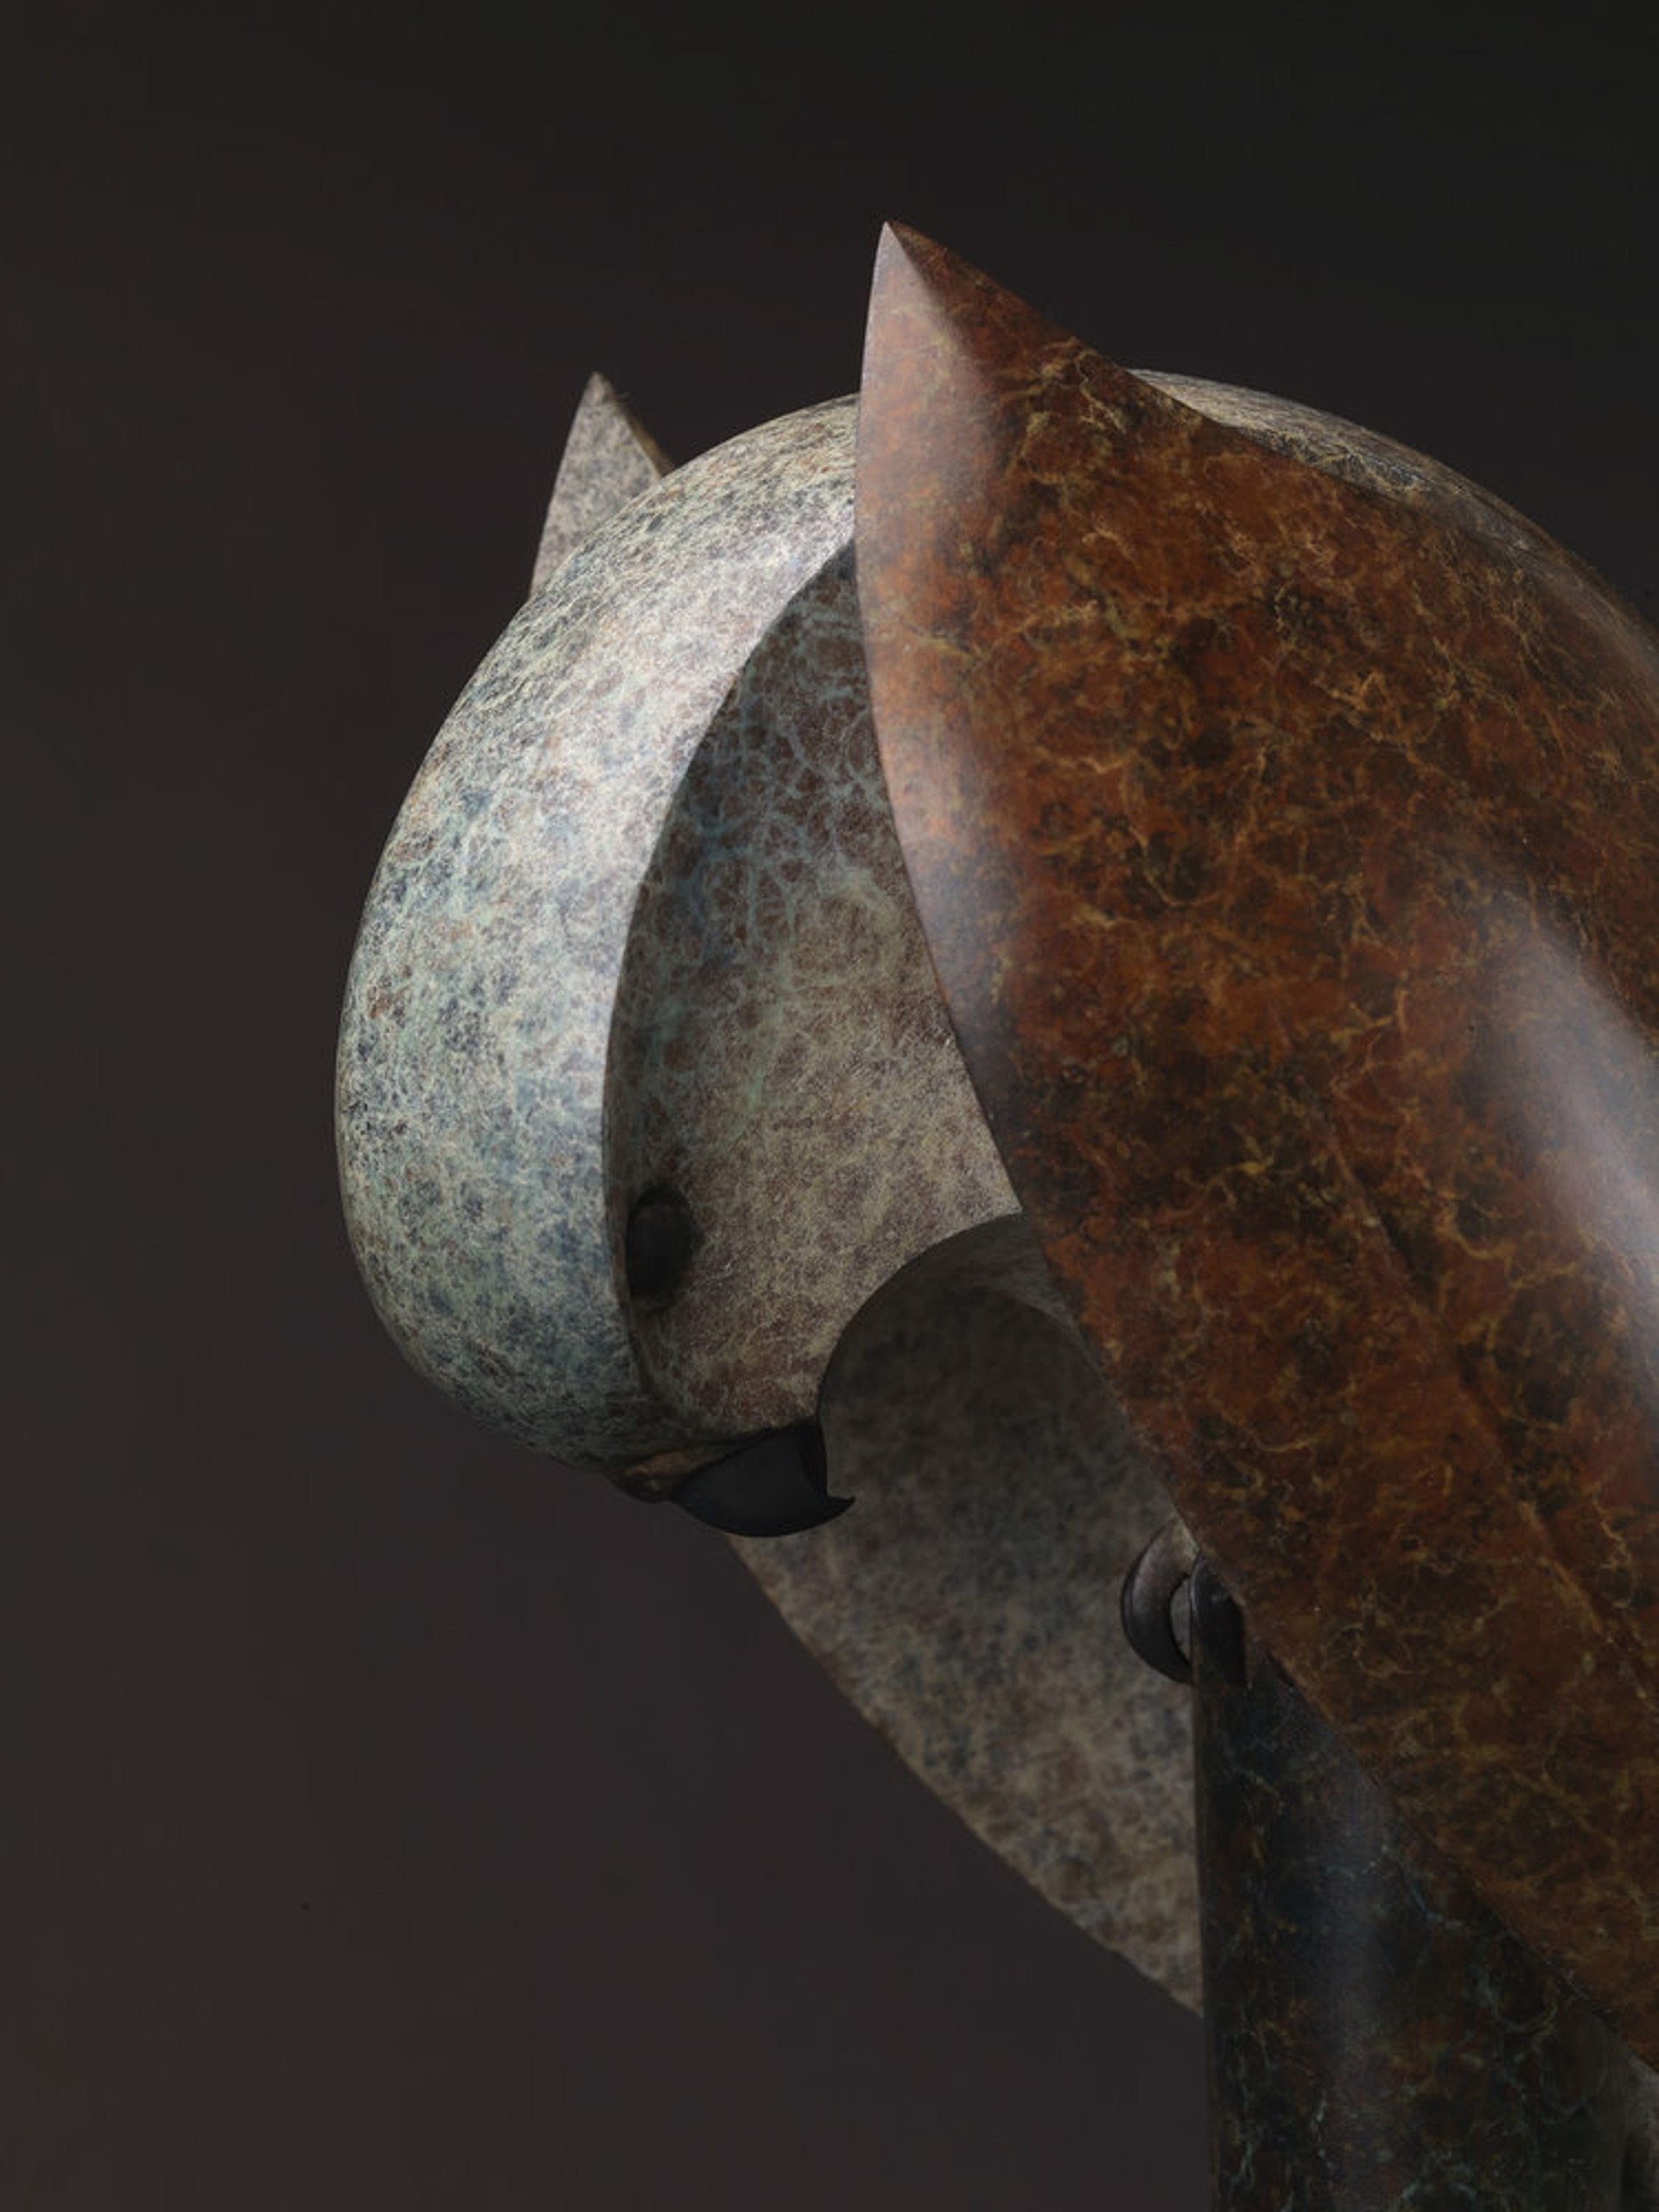 Kestrel by Paul Harvey